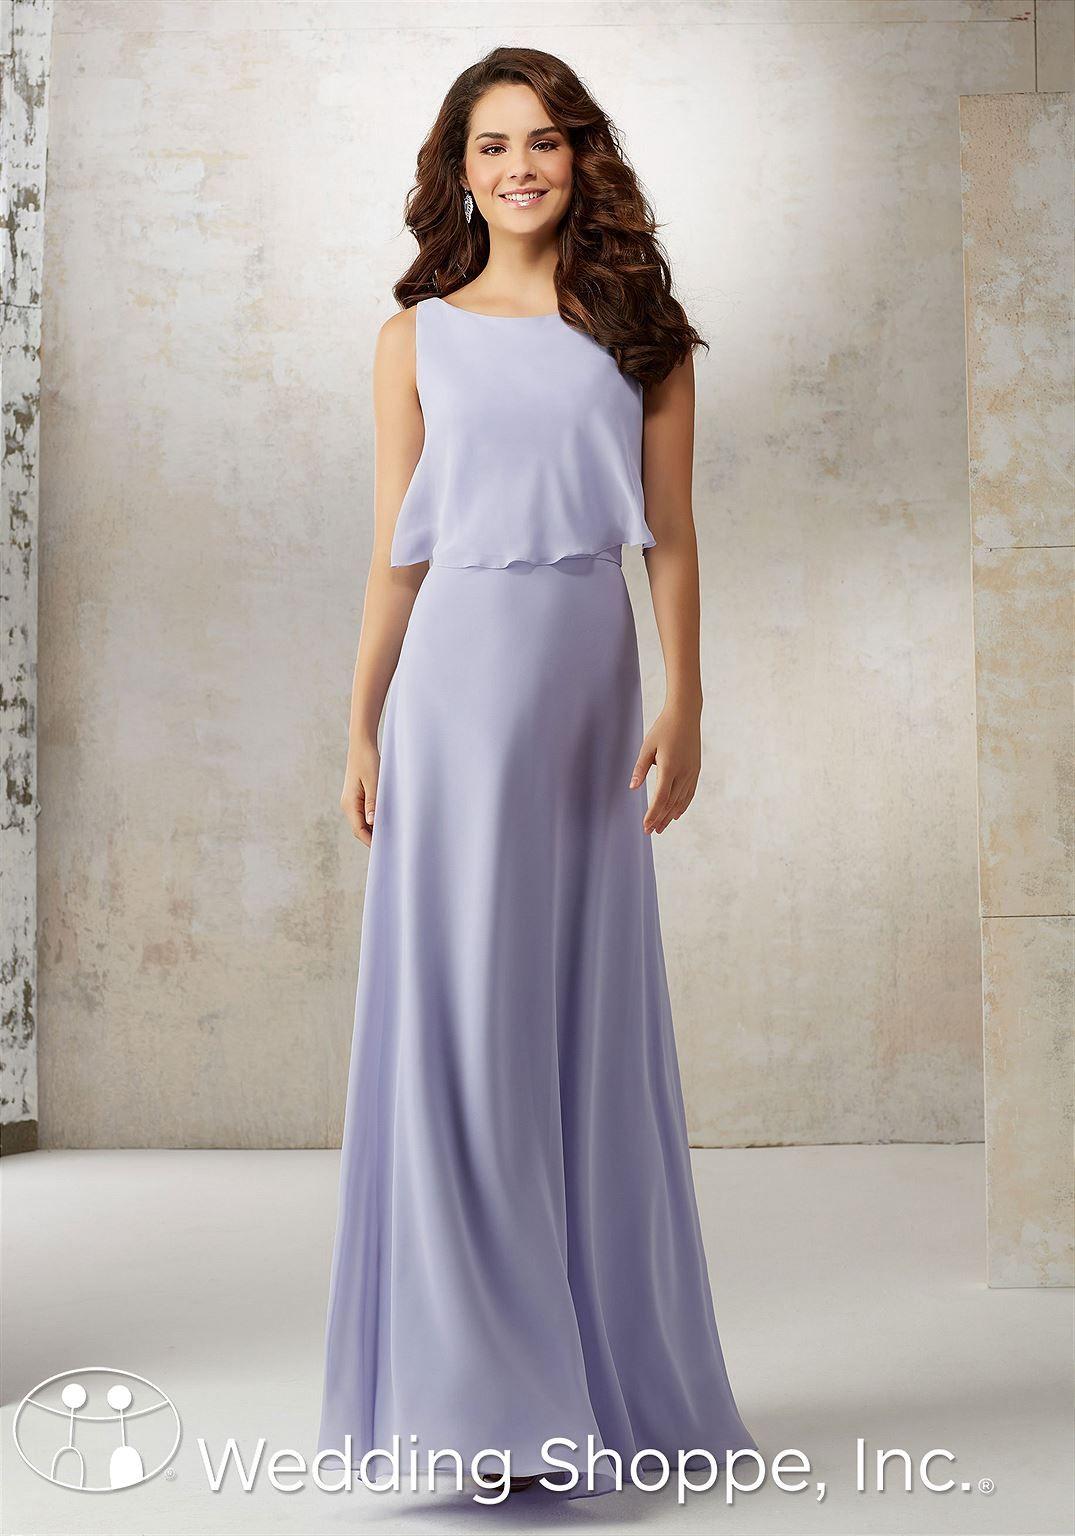 Mori lee bridesmaid dress tenue invités pinterest flowy